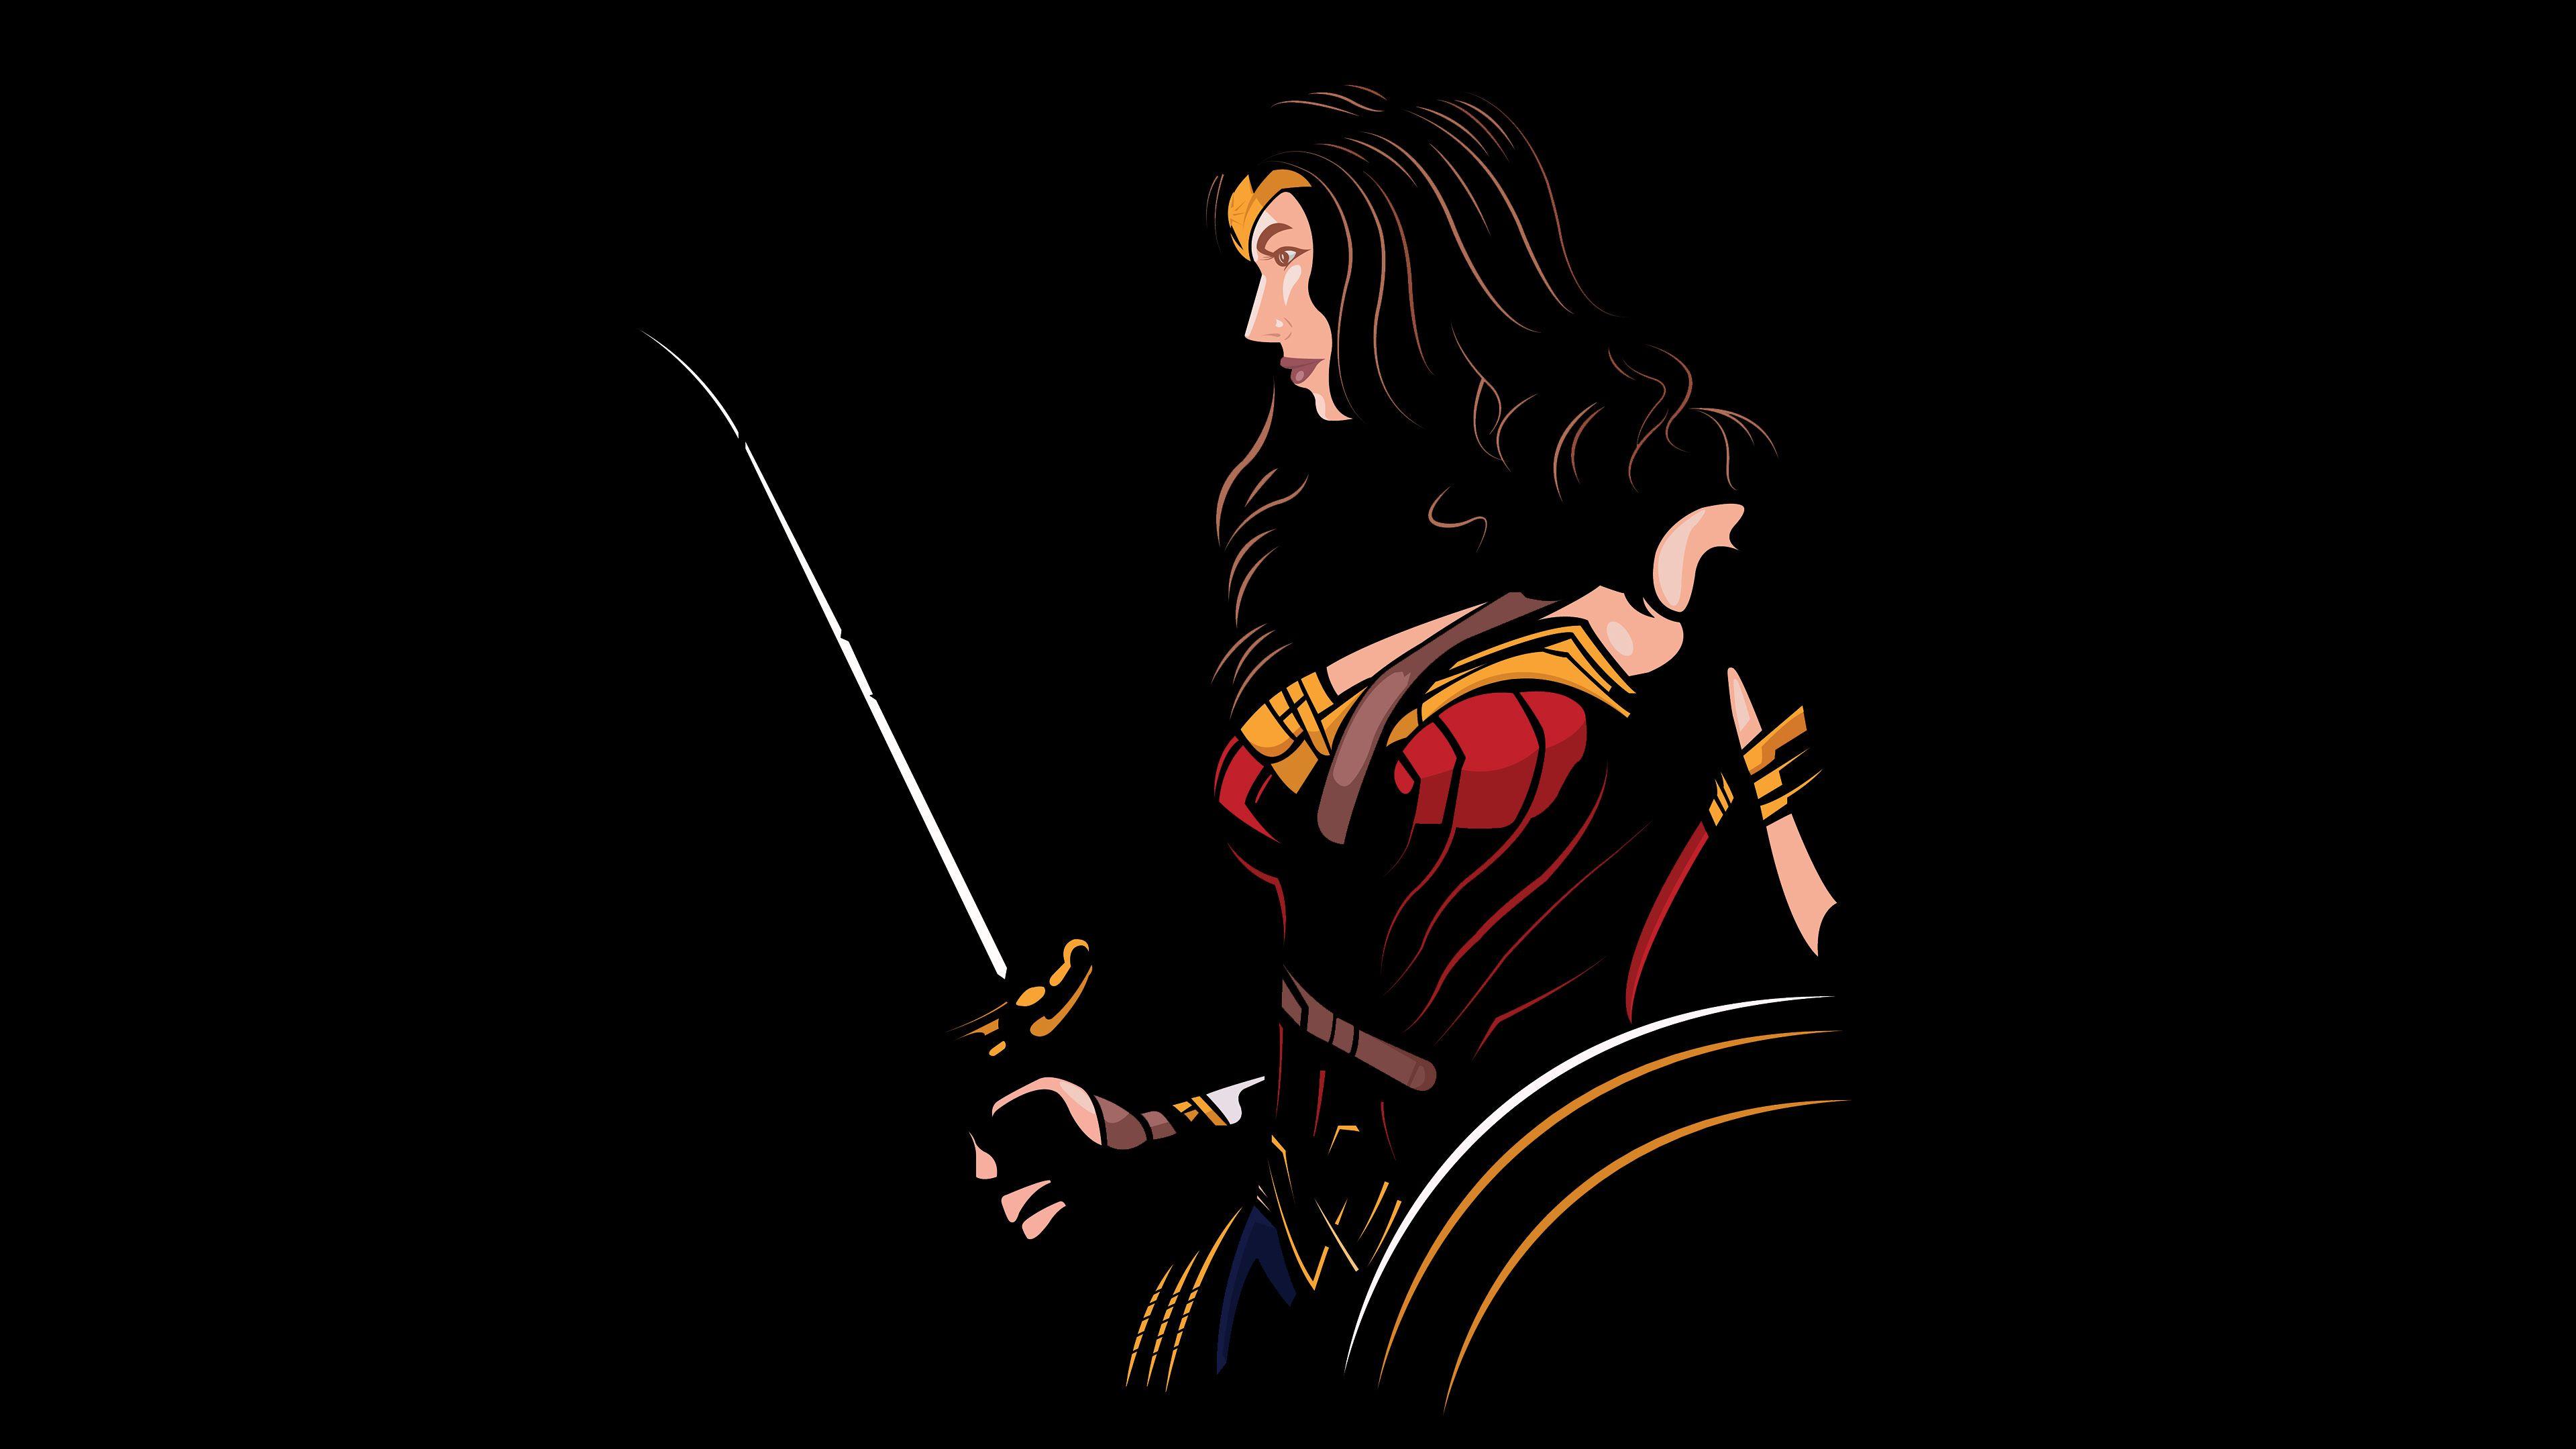 Wonder Woman 4k Minimalism wonder woman wallpapers